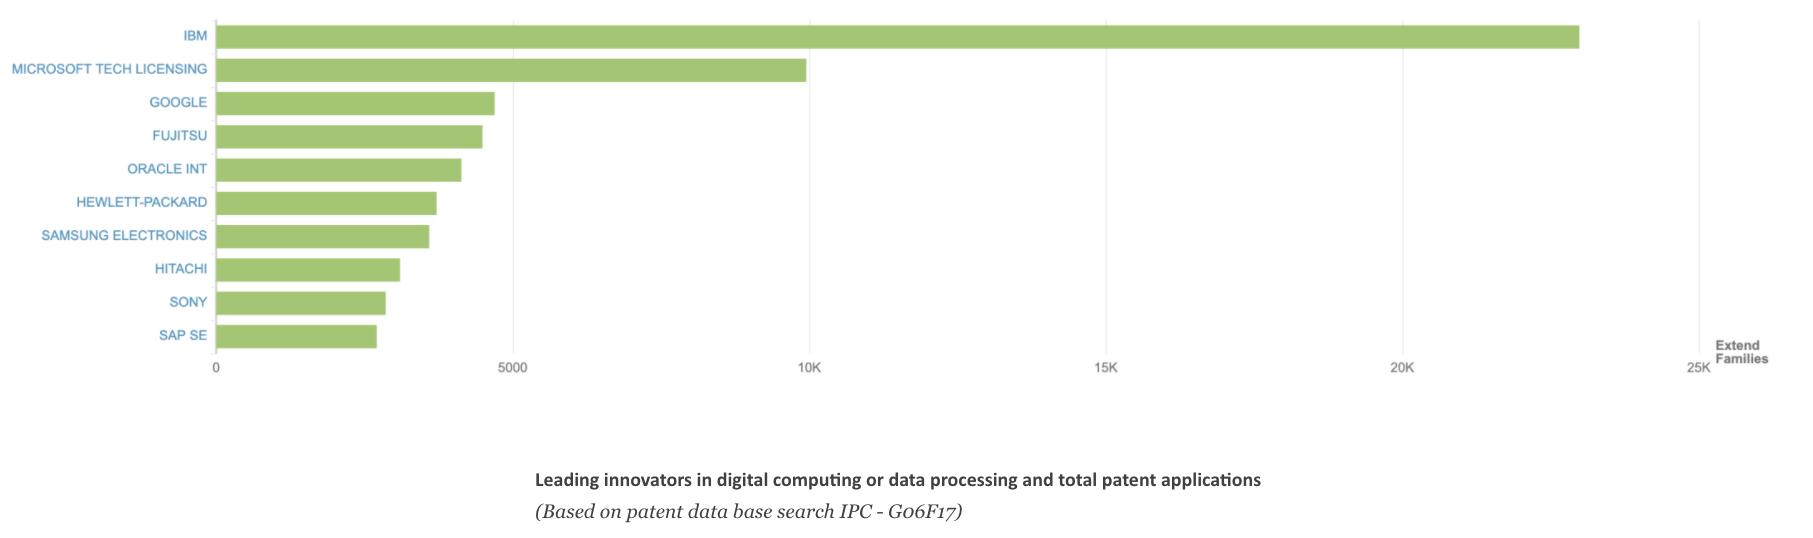 Leading Data Innovators